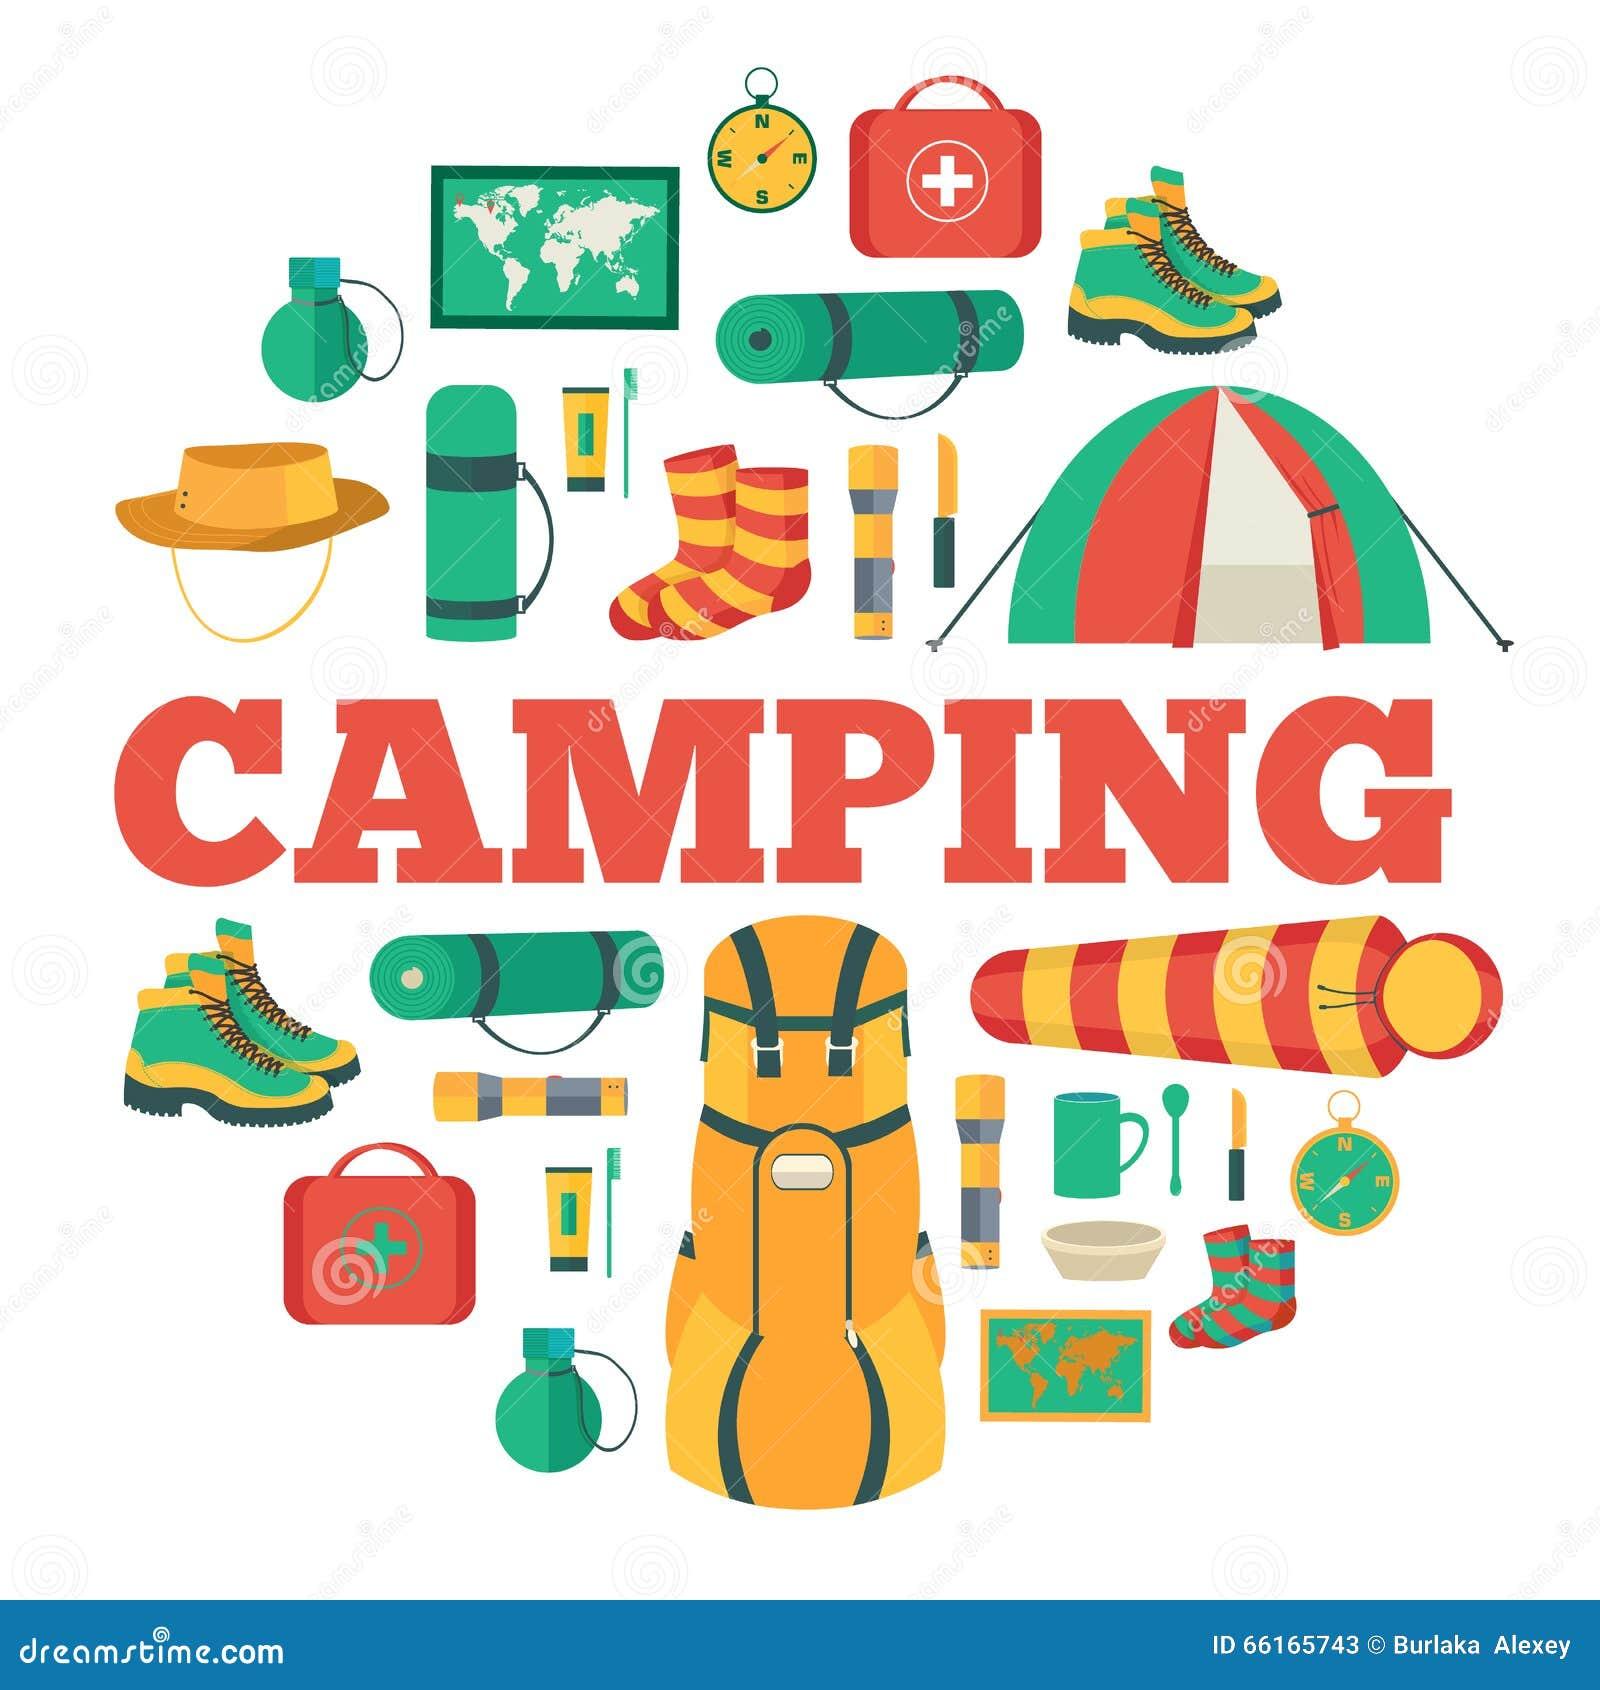 Camping equipme...